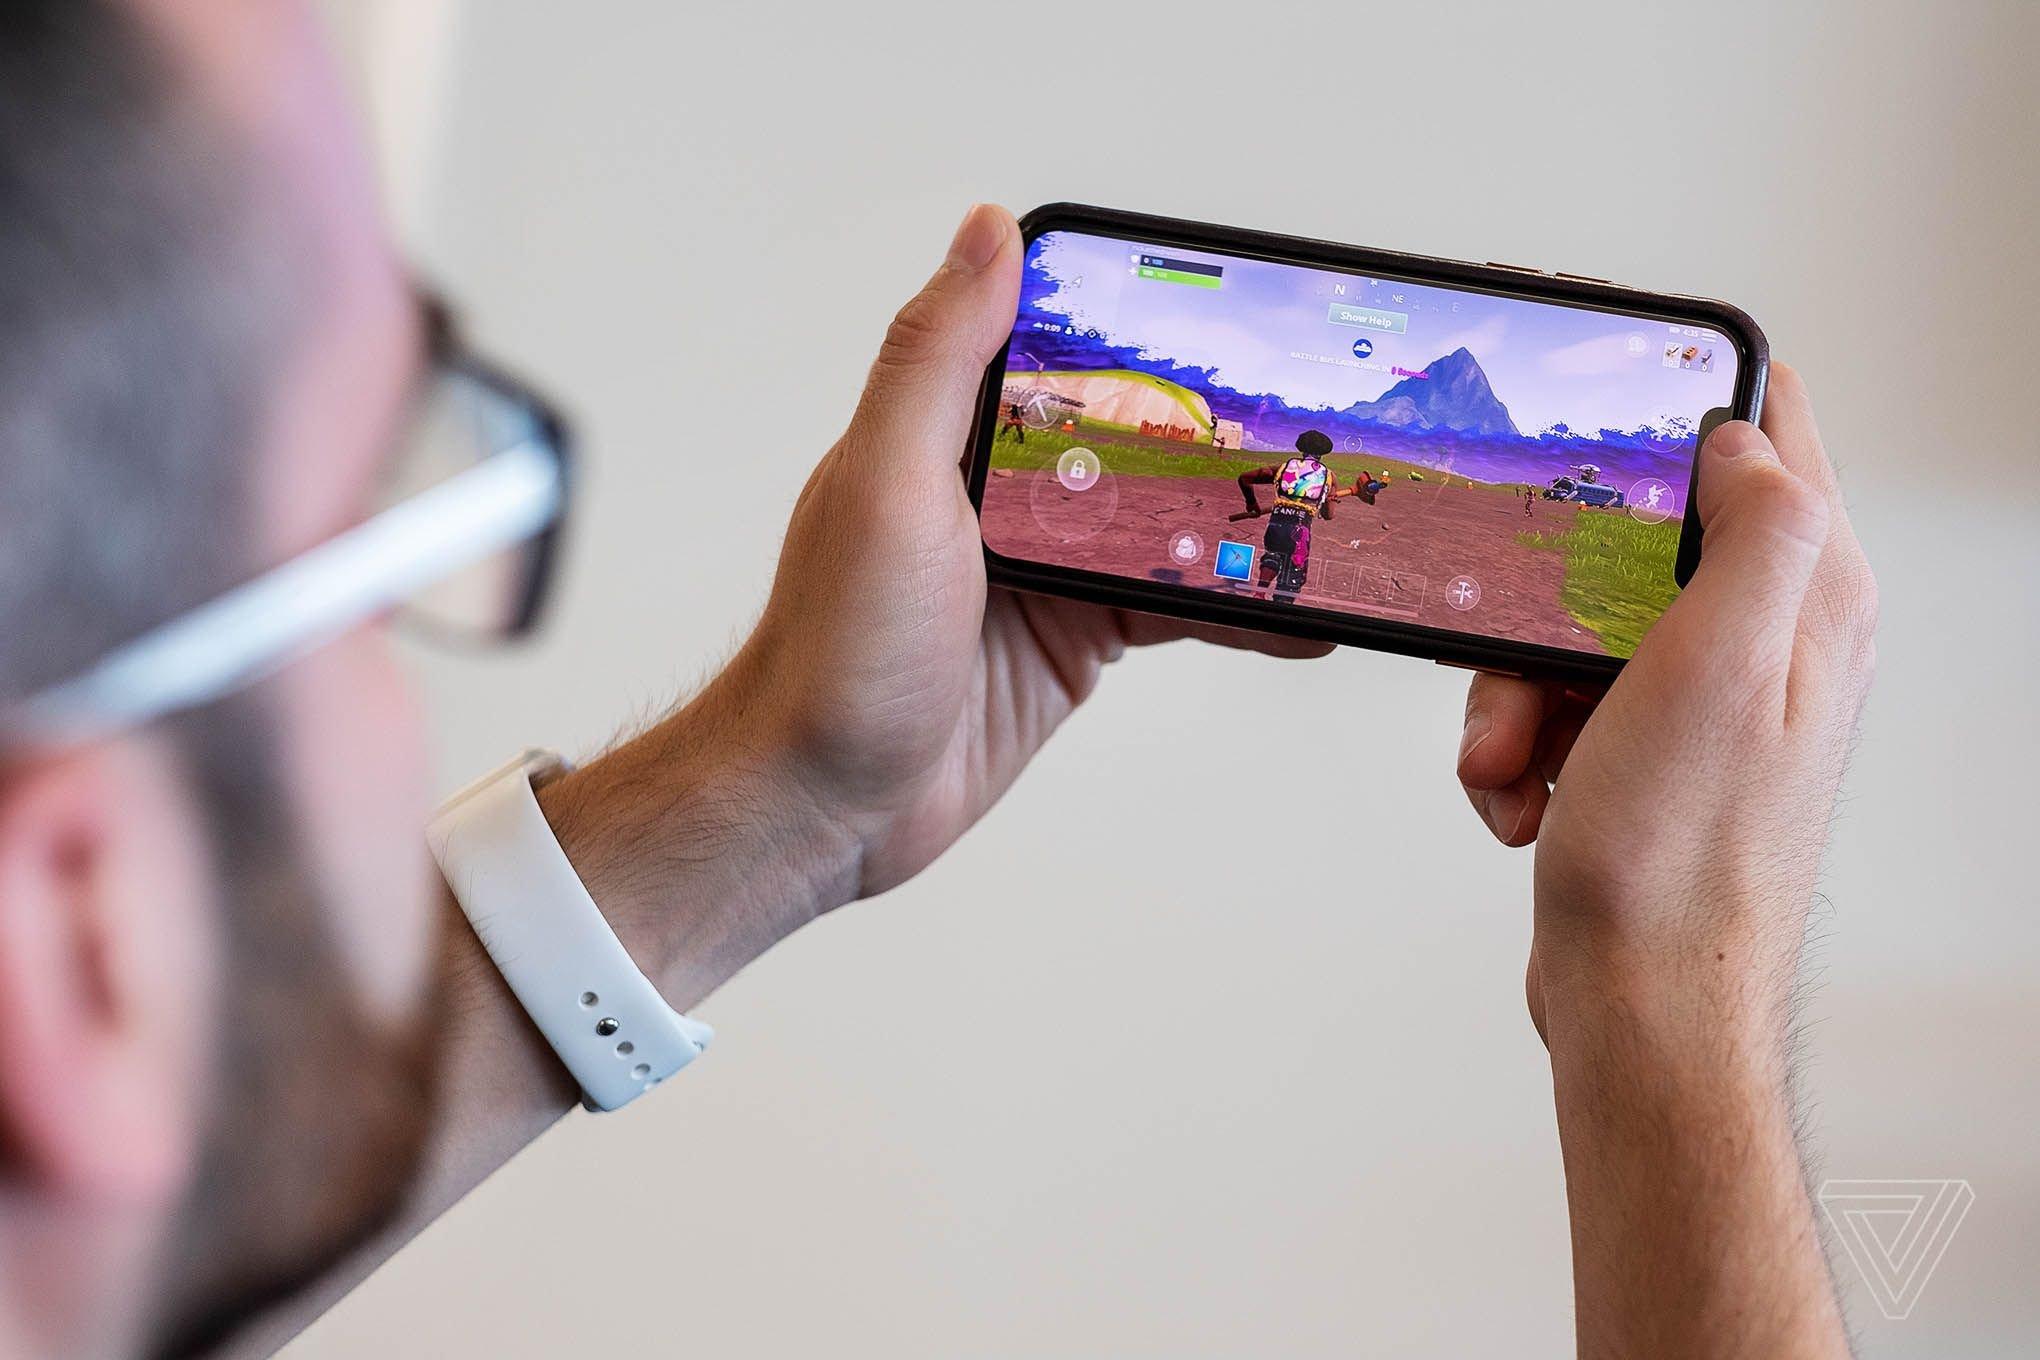 Fortnite Apple iOS Epic Games